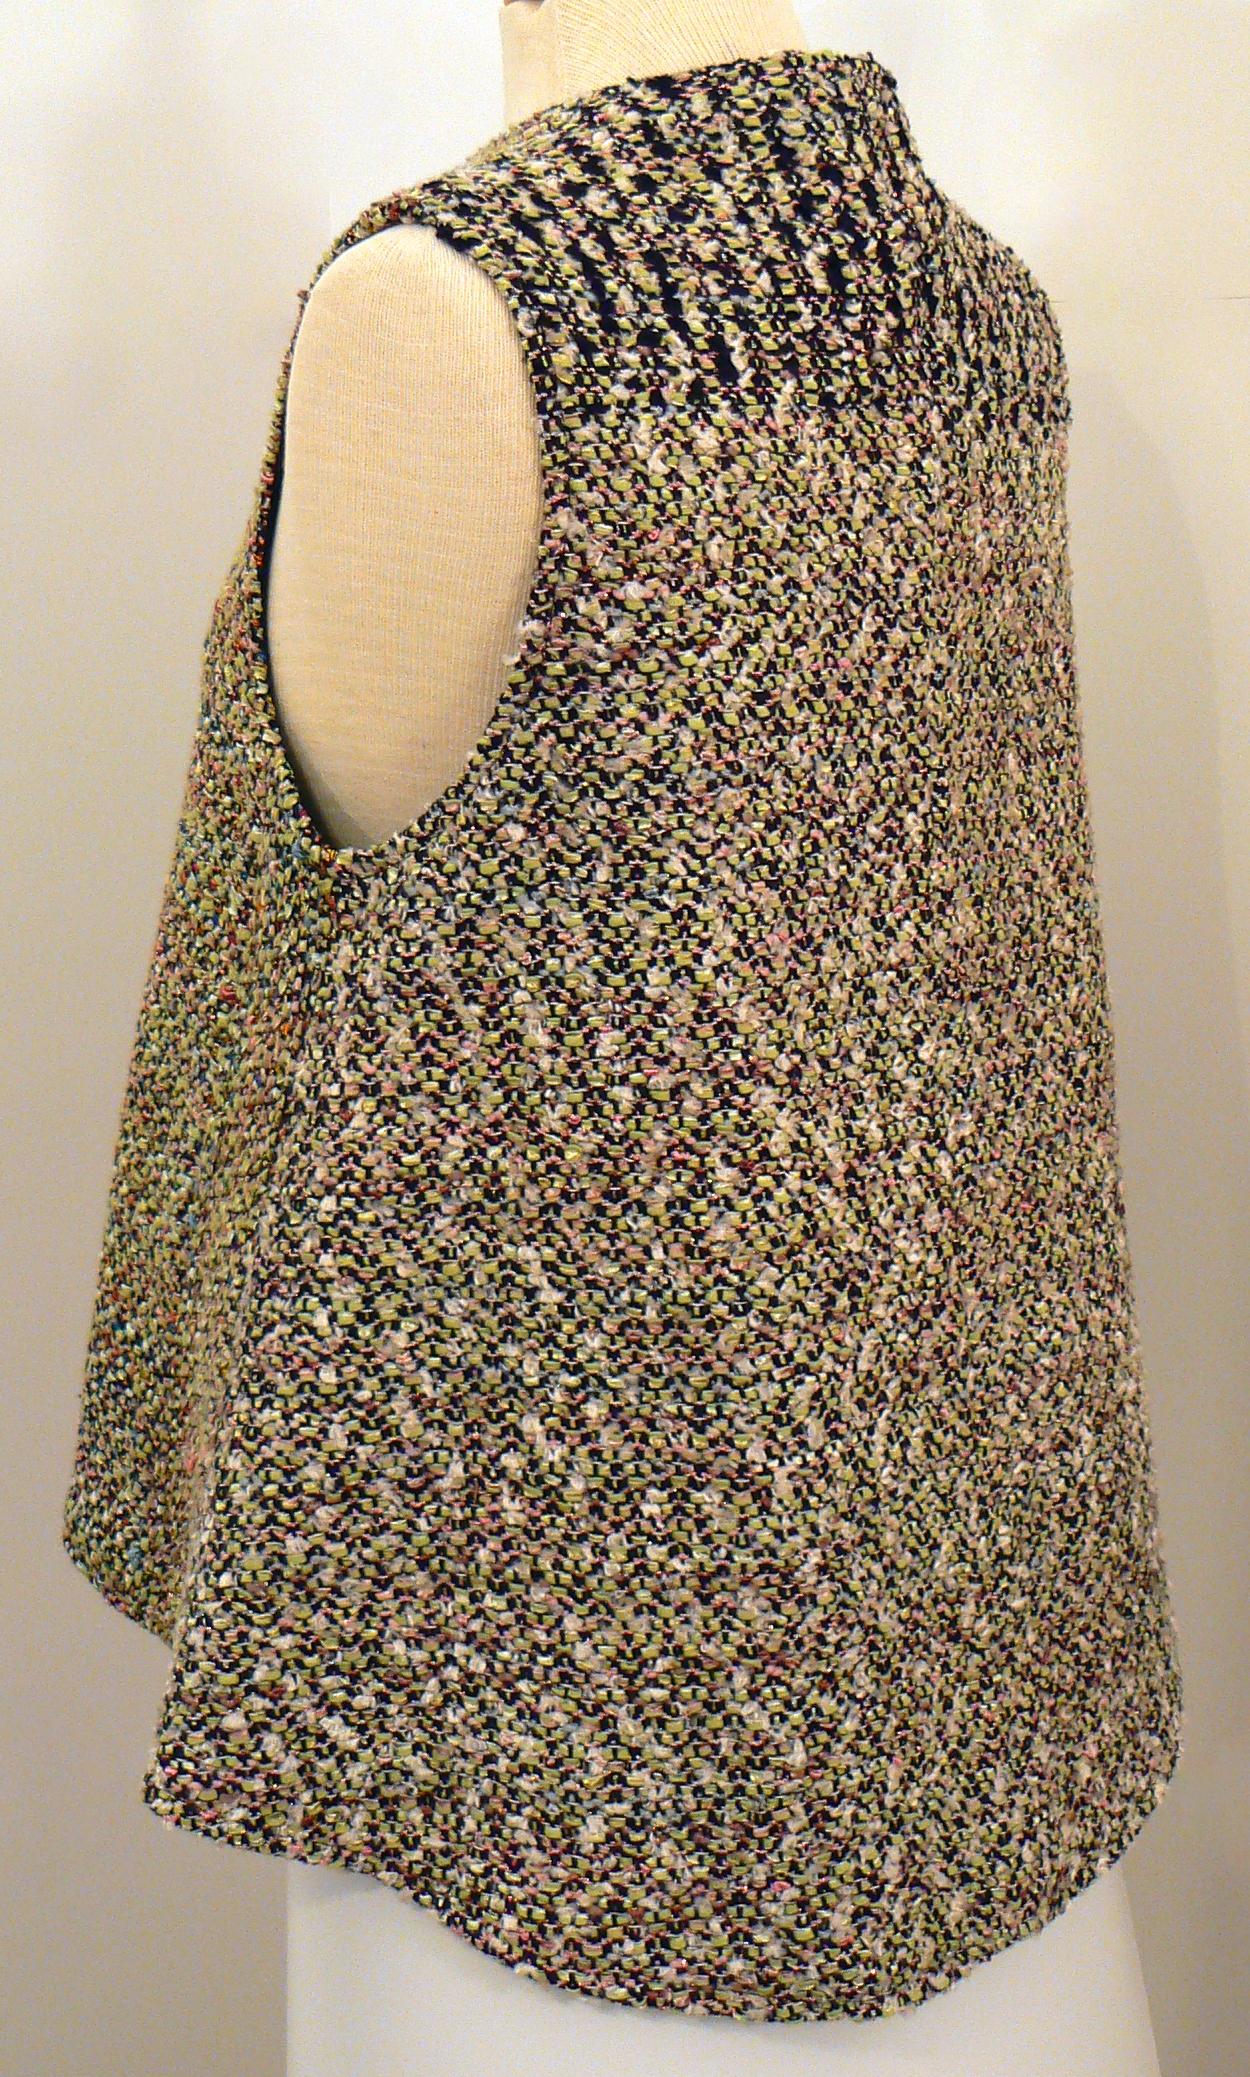 Handwoven Clothing, Vest, Kathleen Weir-West, 14-001.JPG